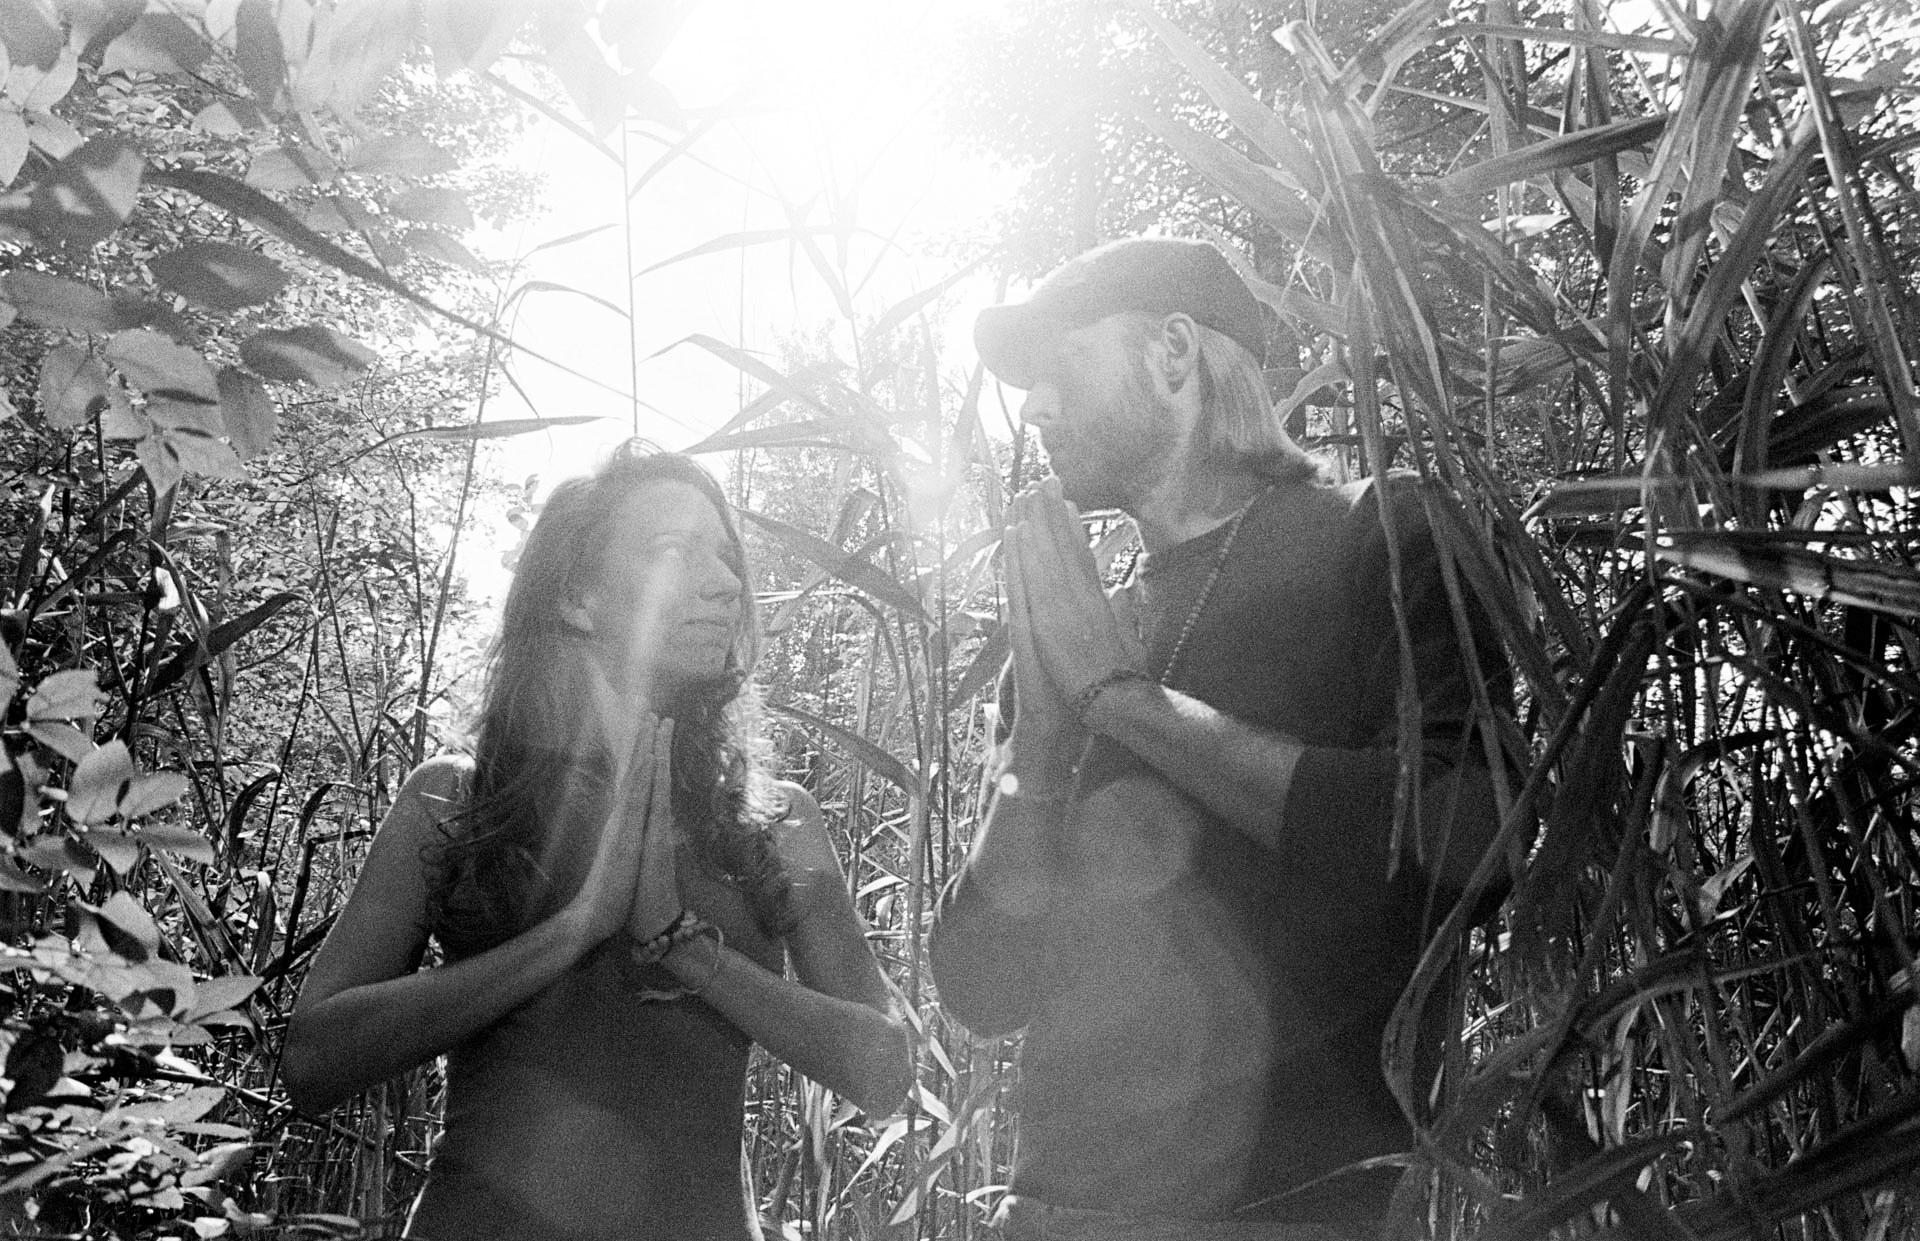 Cass Greener and Sean Dunne - Filmmakers & Psychonauts - Rutliated Quartz